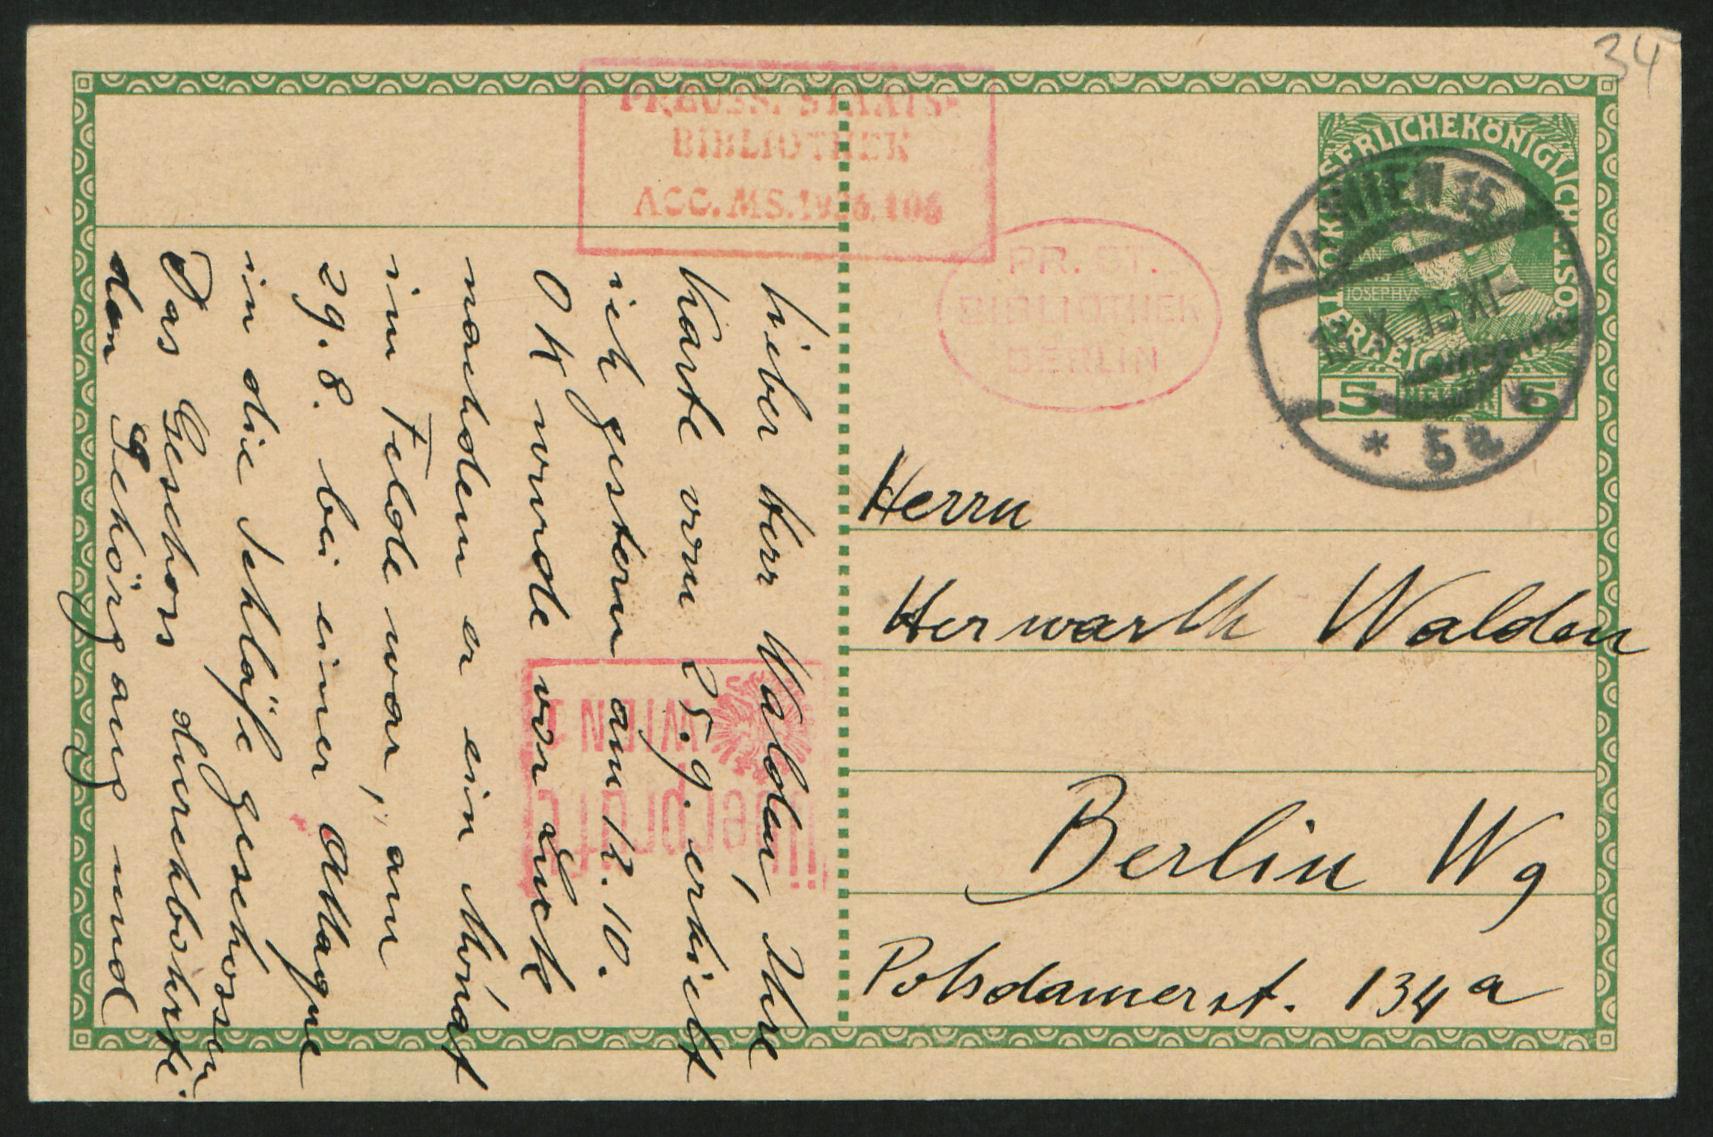 Postcard by Adolf Loos about Oskar Kokoschka's injury